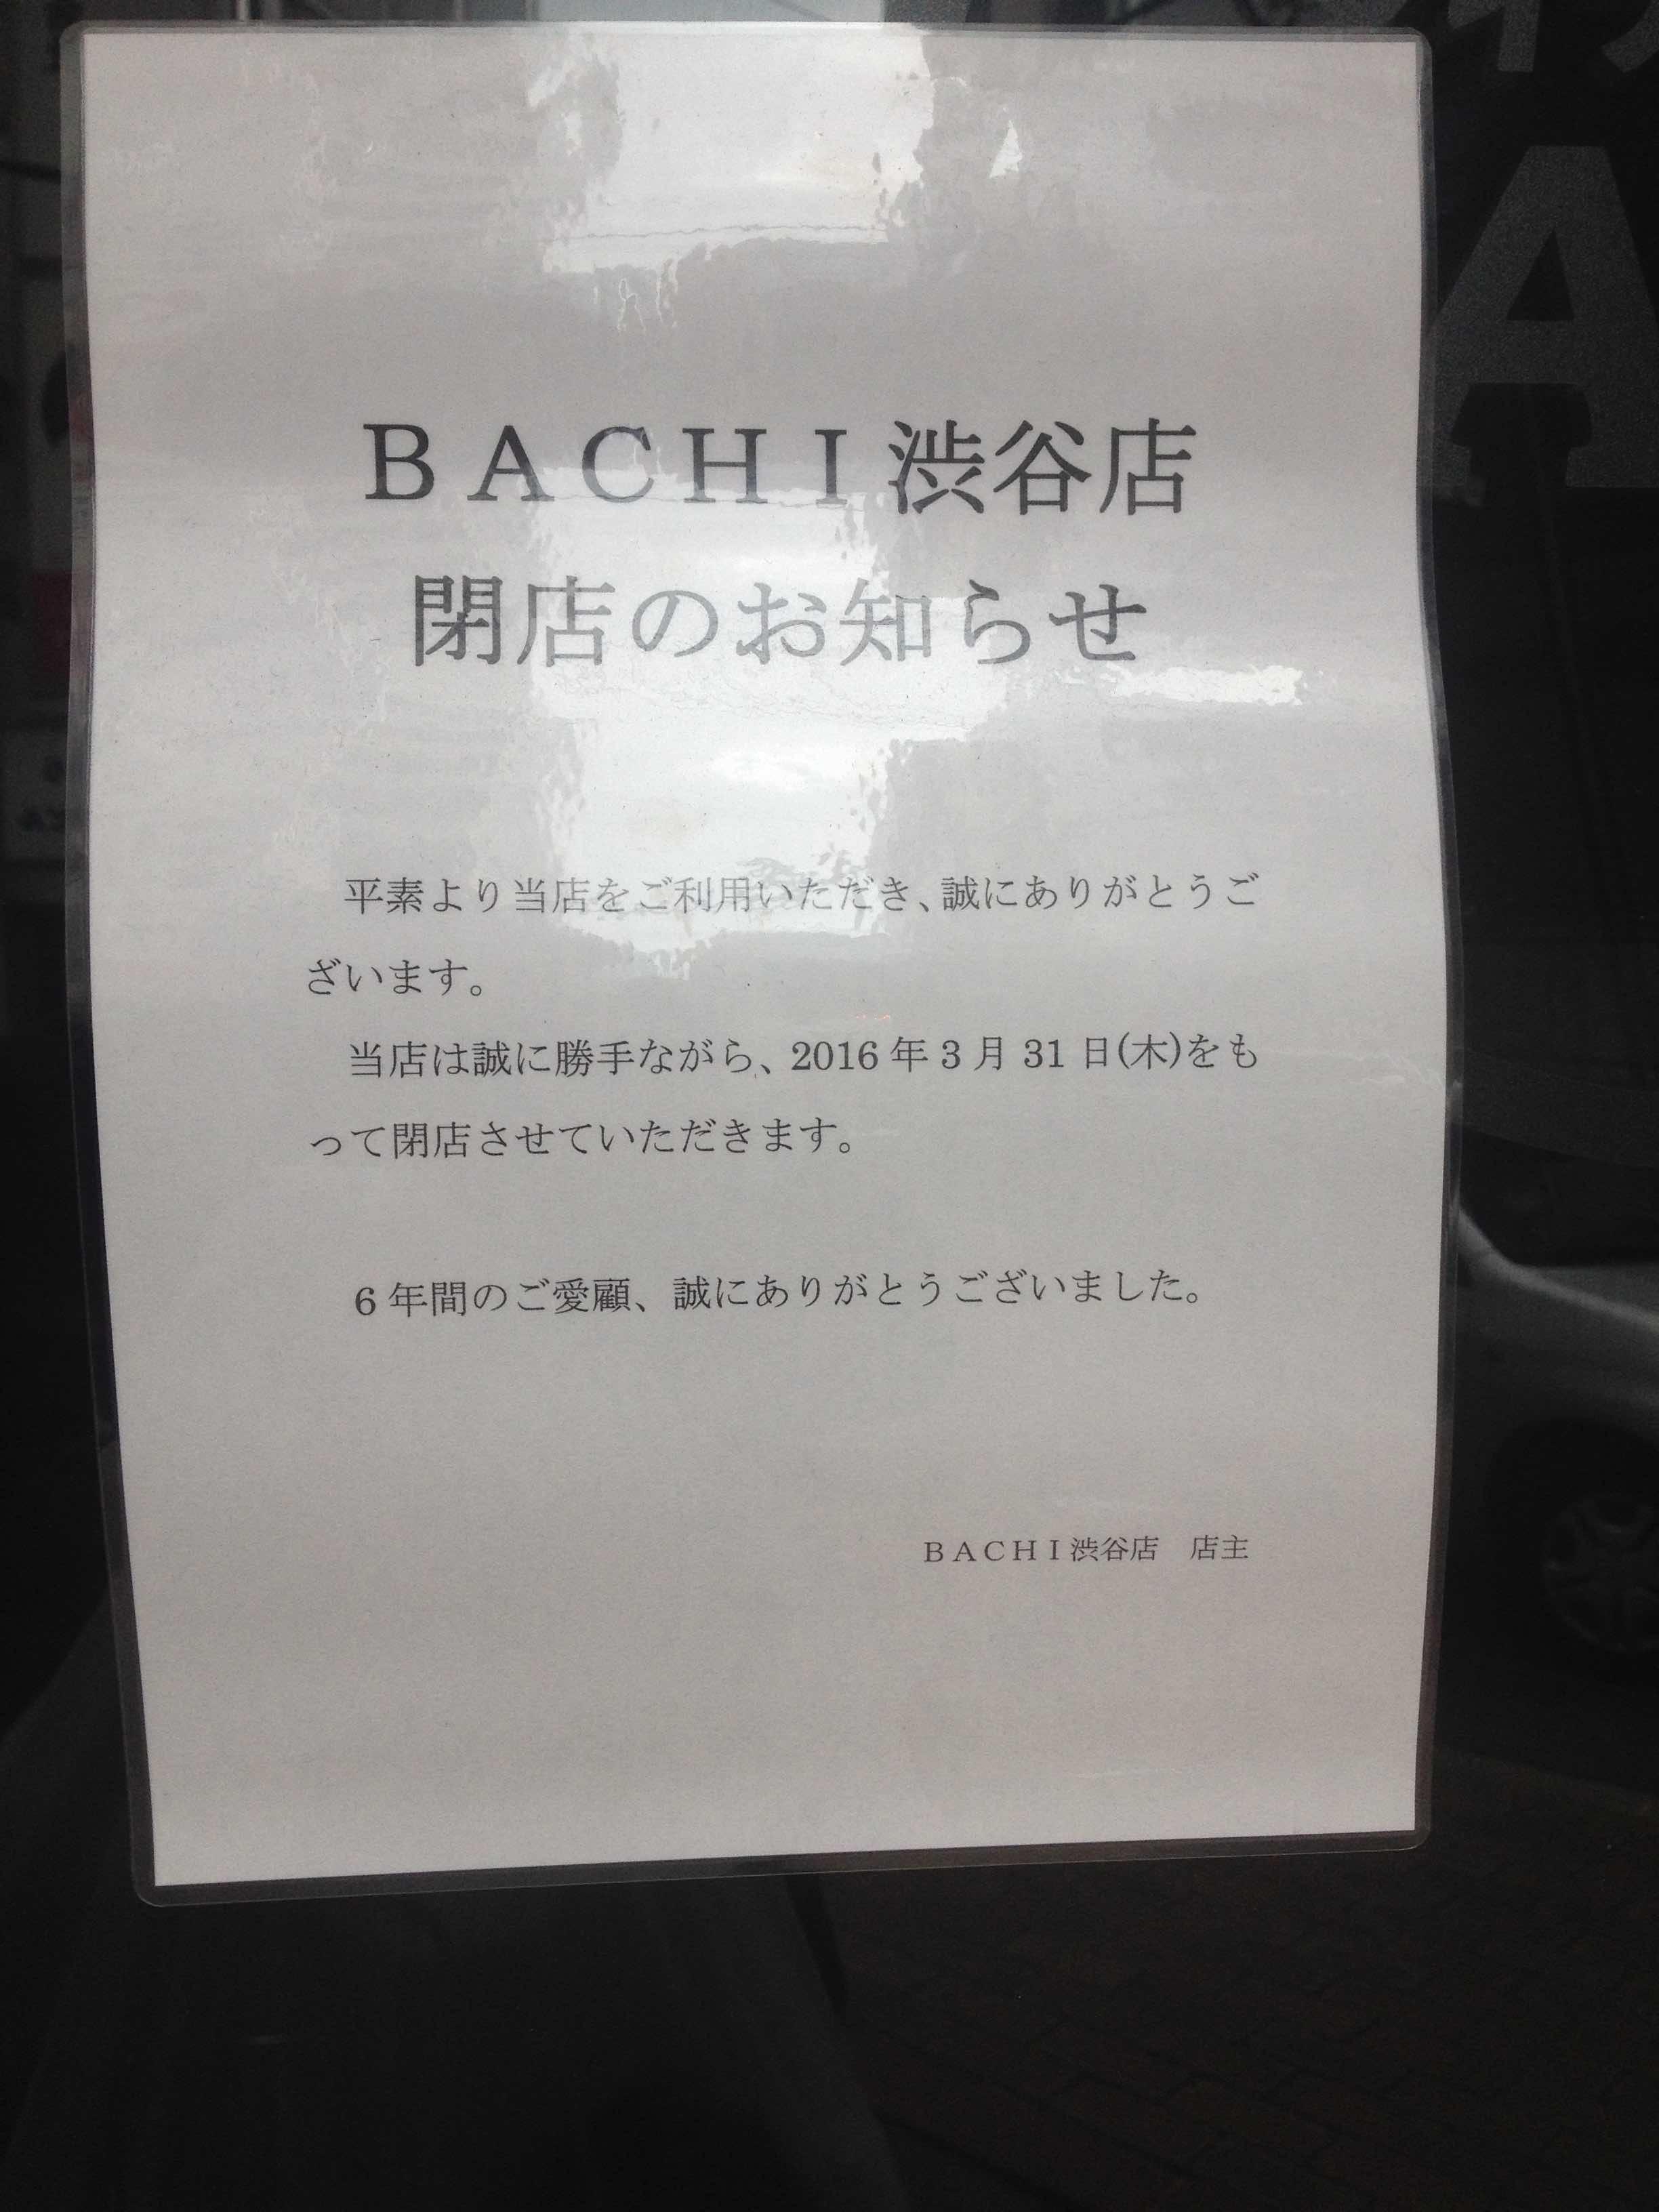 BACHI.jpg